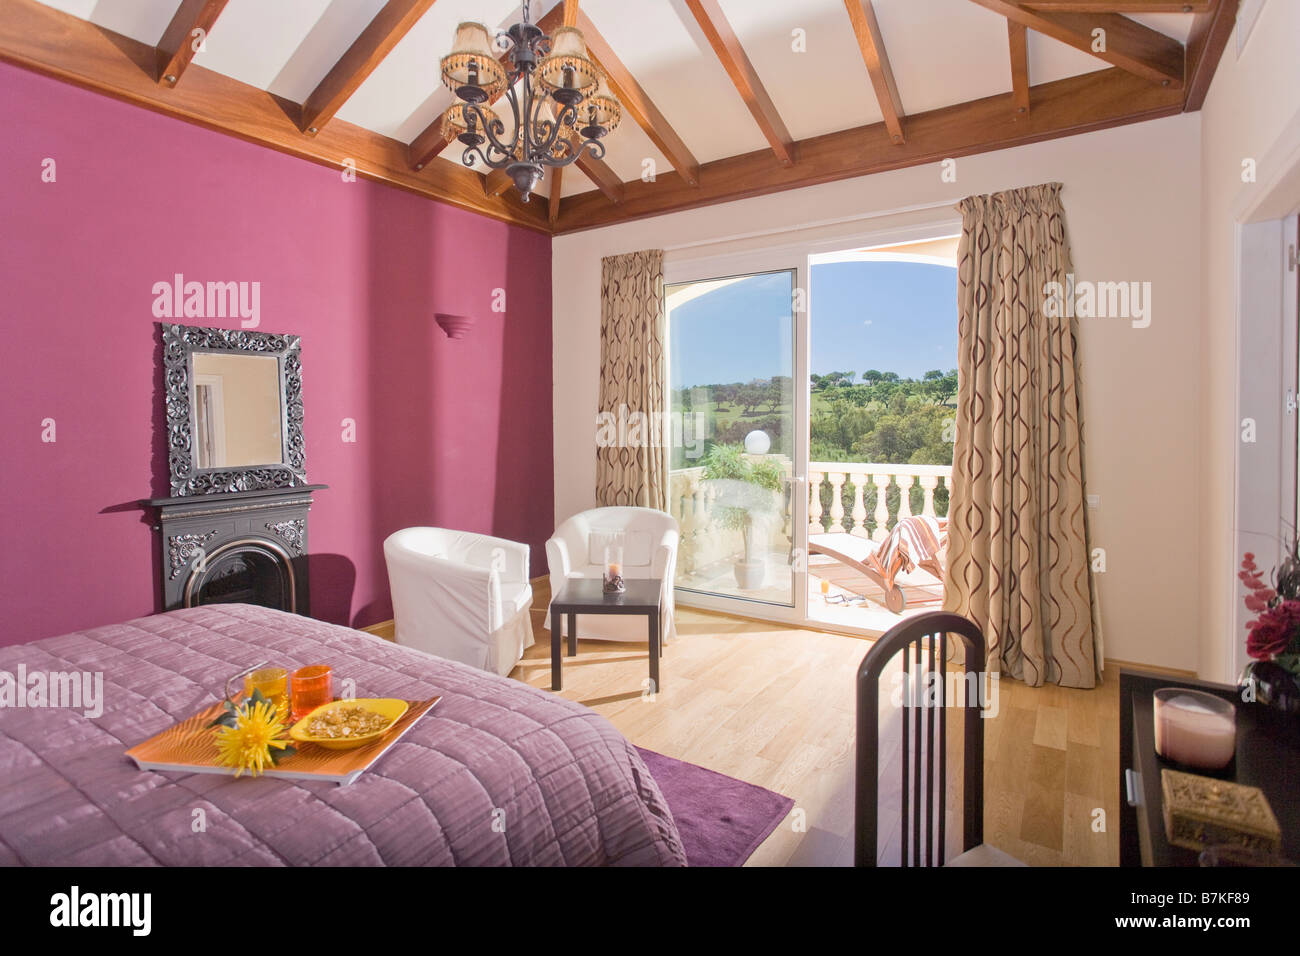 Mauve Quilt On Bed In Pink Bedroom Overlooking Terrace In Spanish